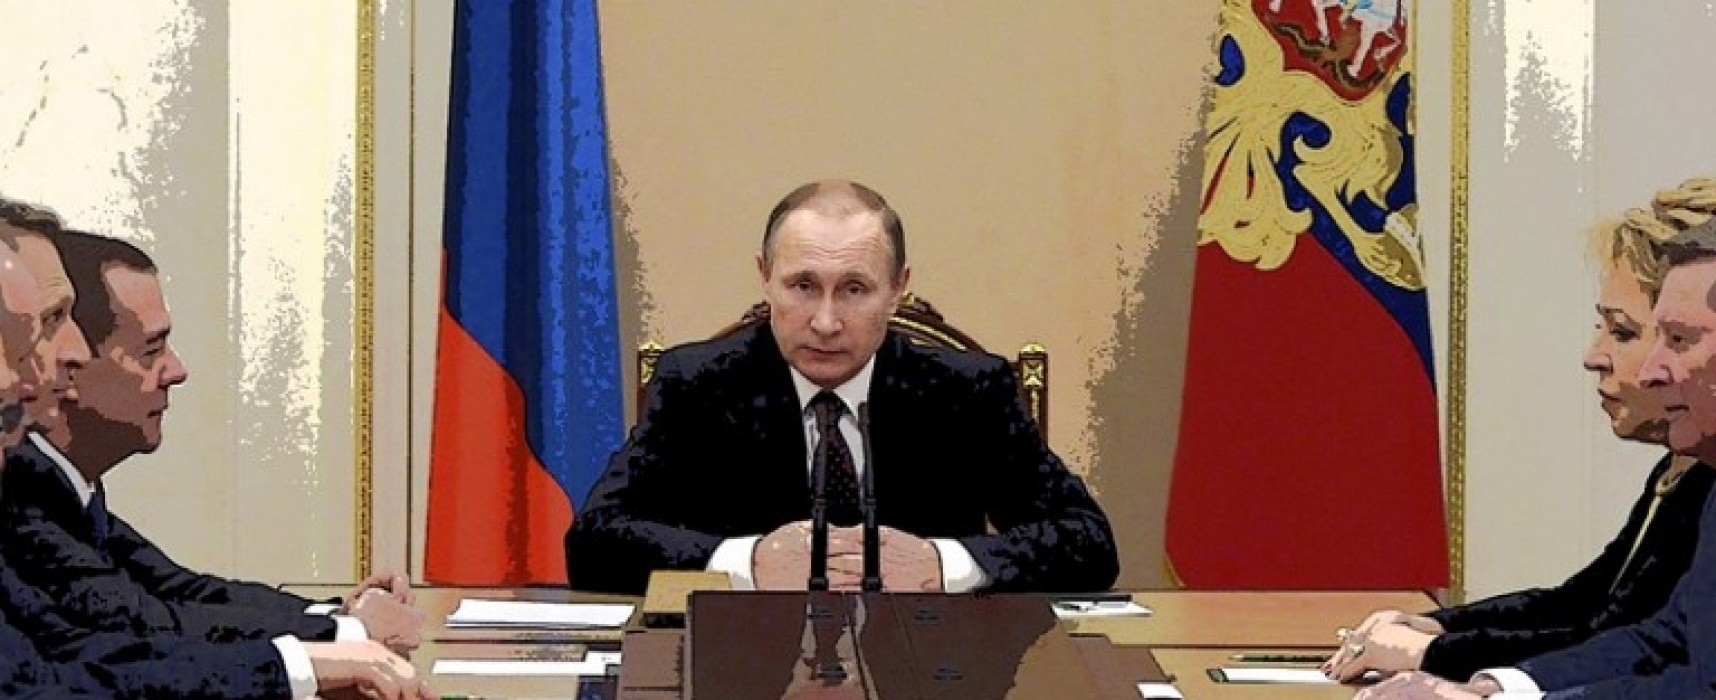 Putin's Radical Friends